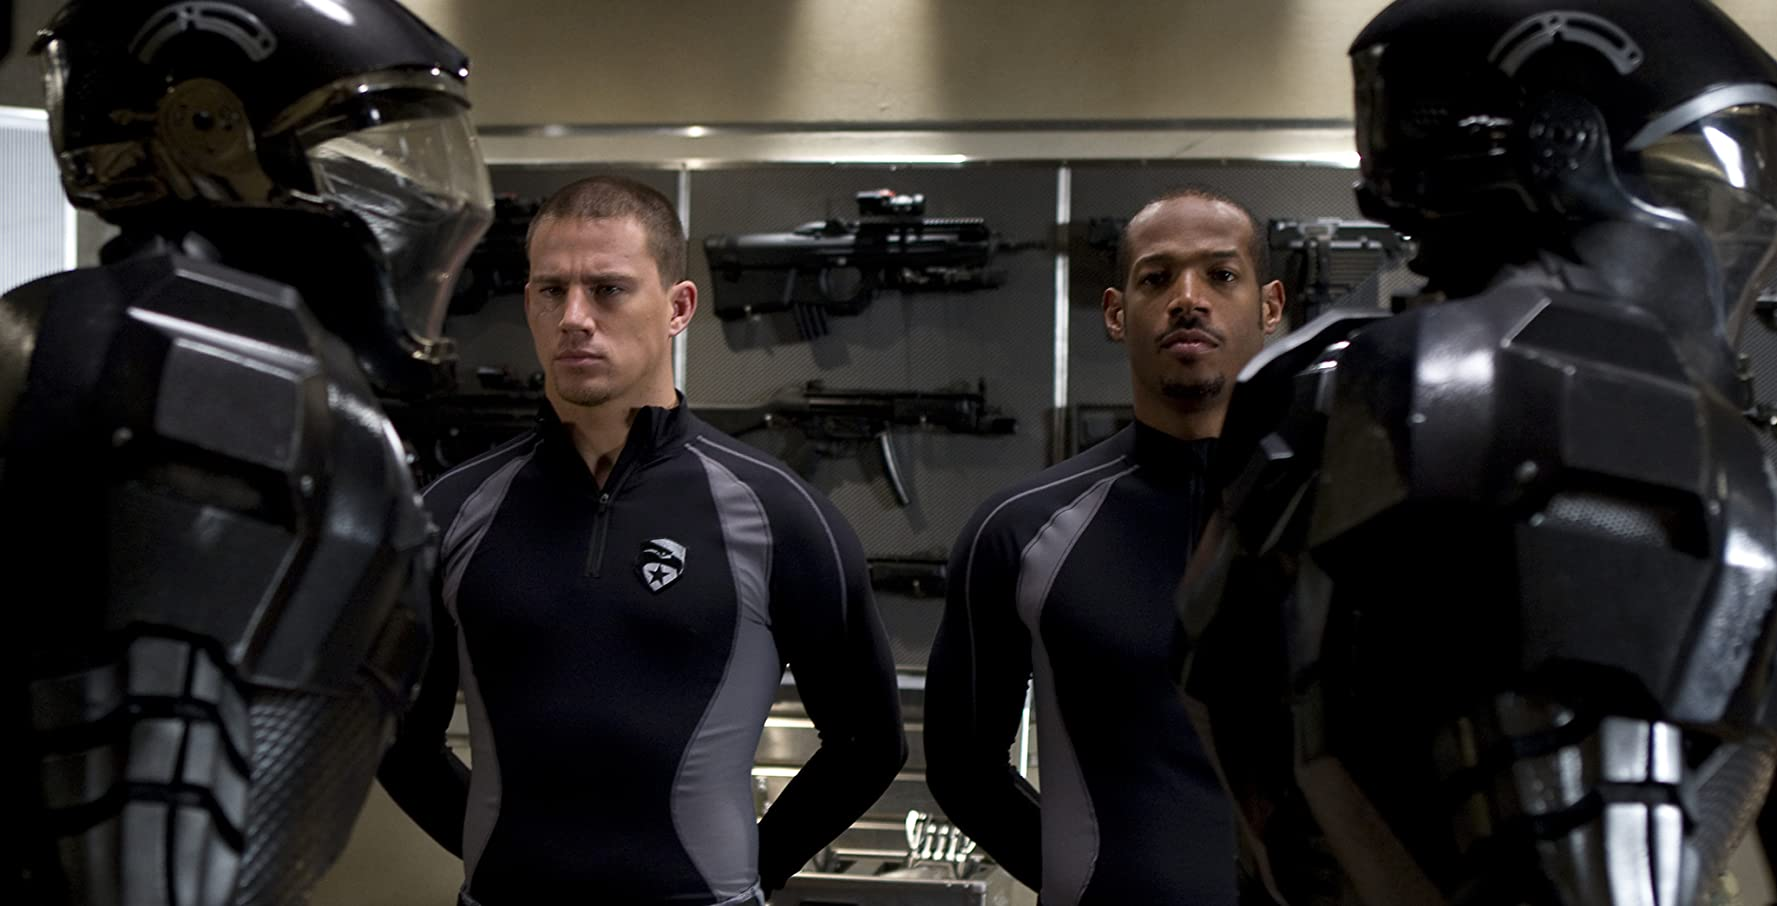 Marlon Wayans and Channing Tatum in G.I. Joe: The Rise of Cobra (2009)